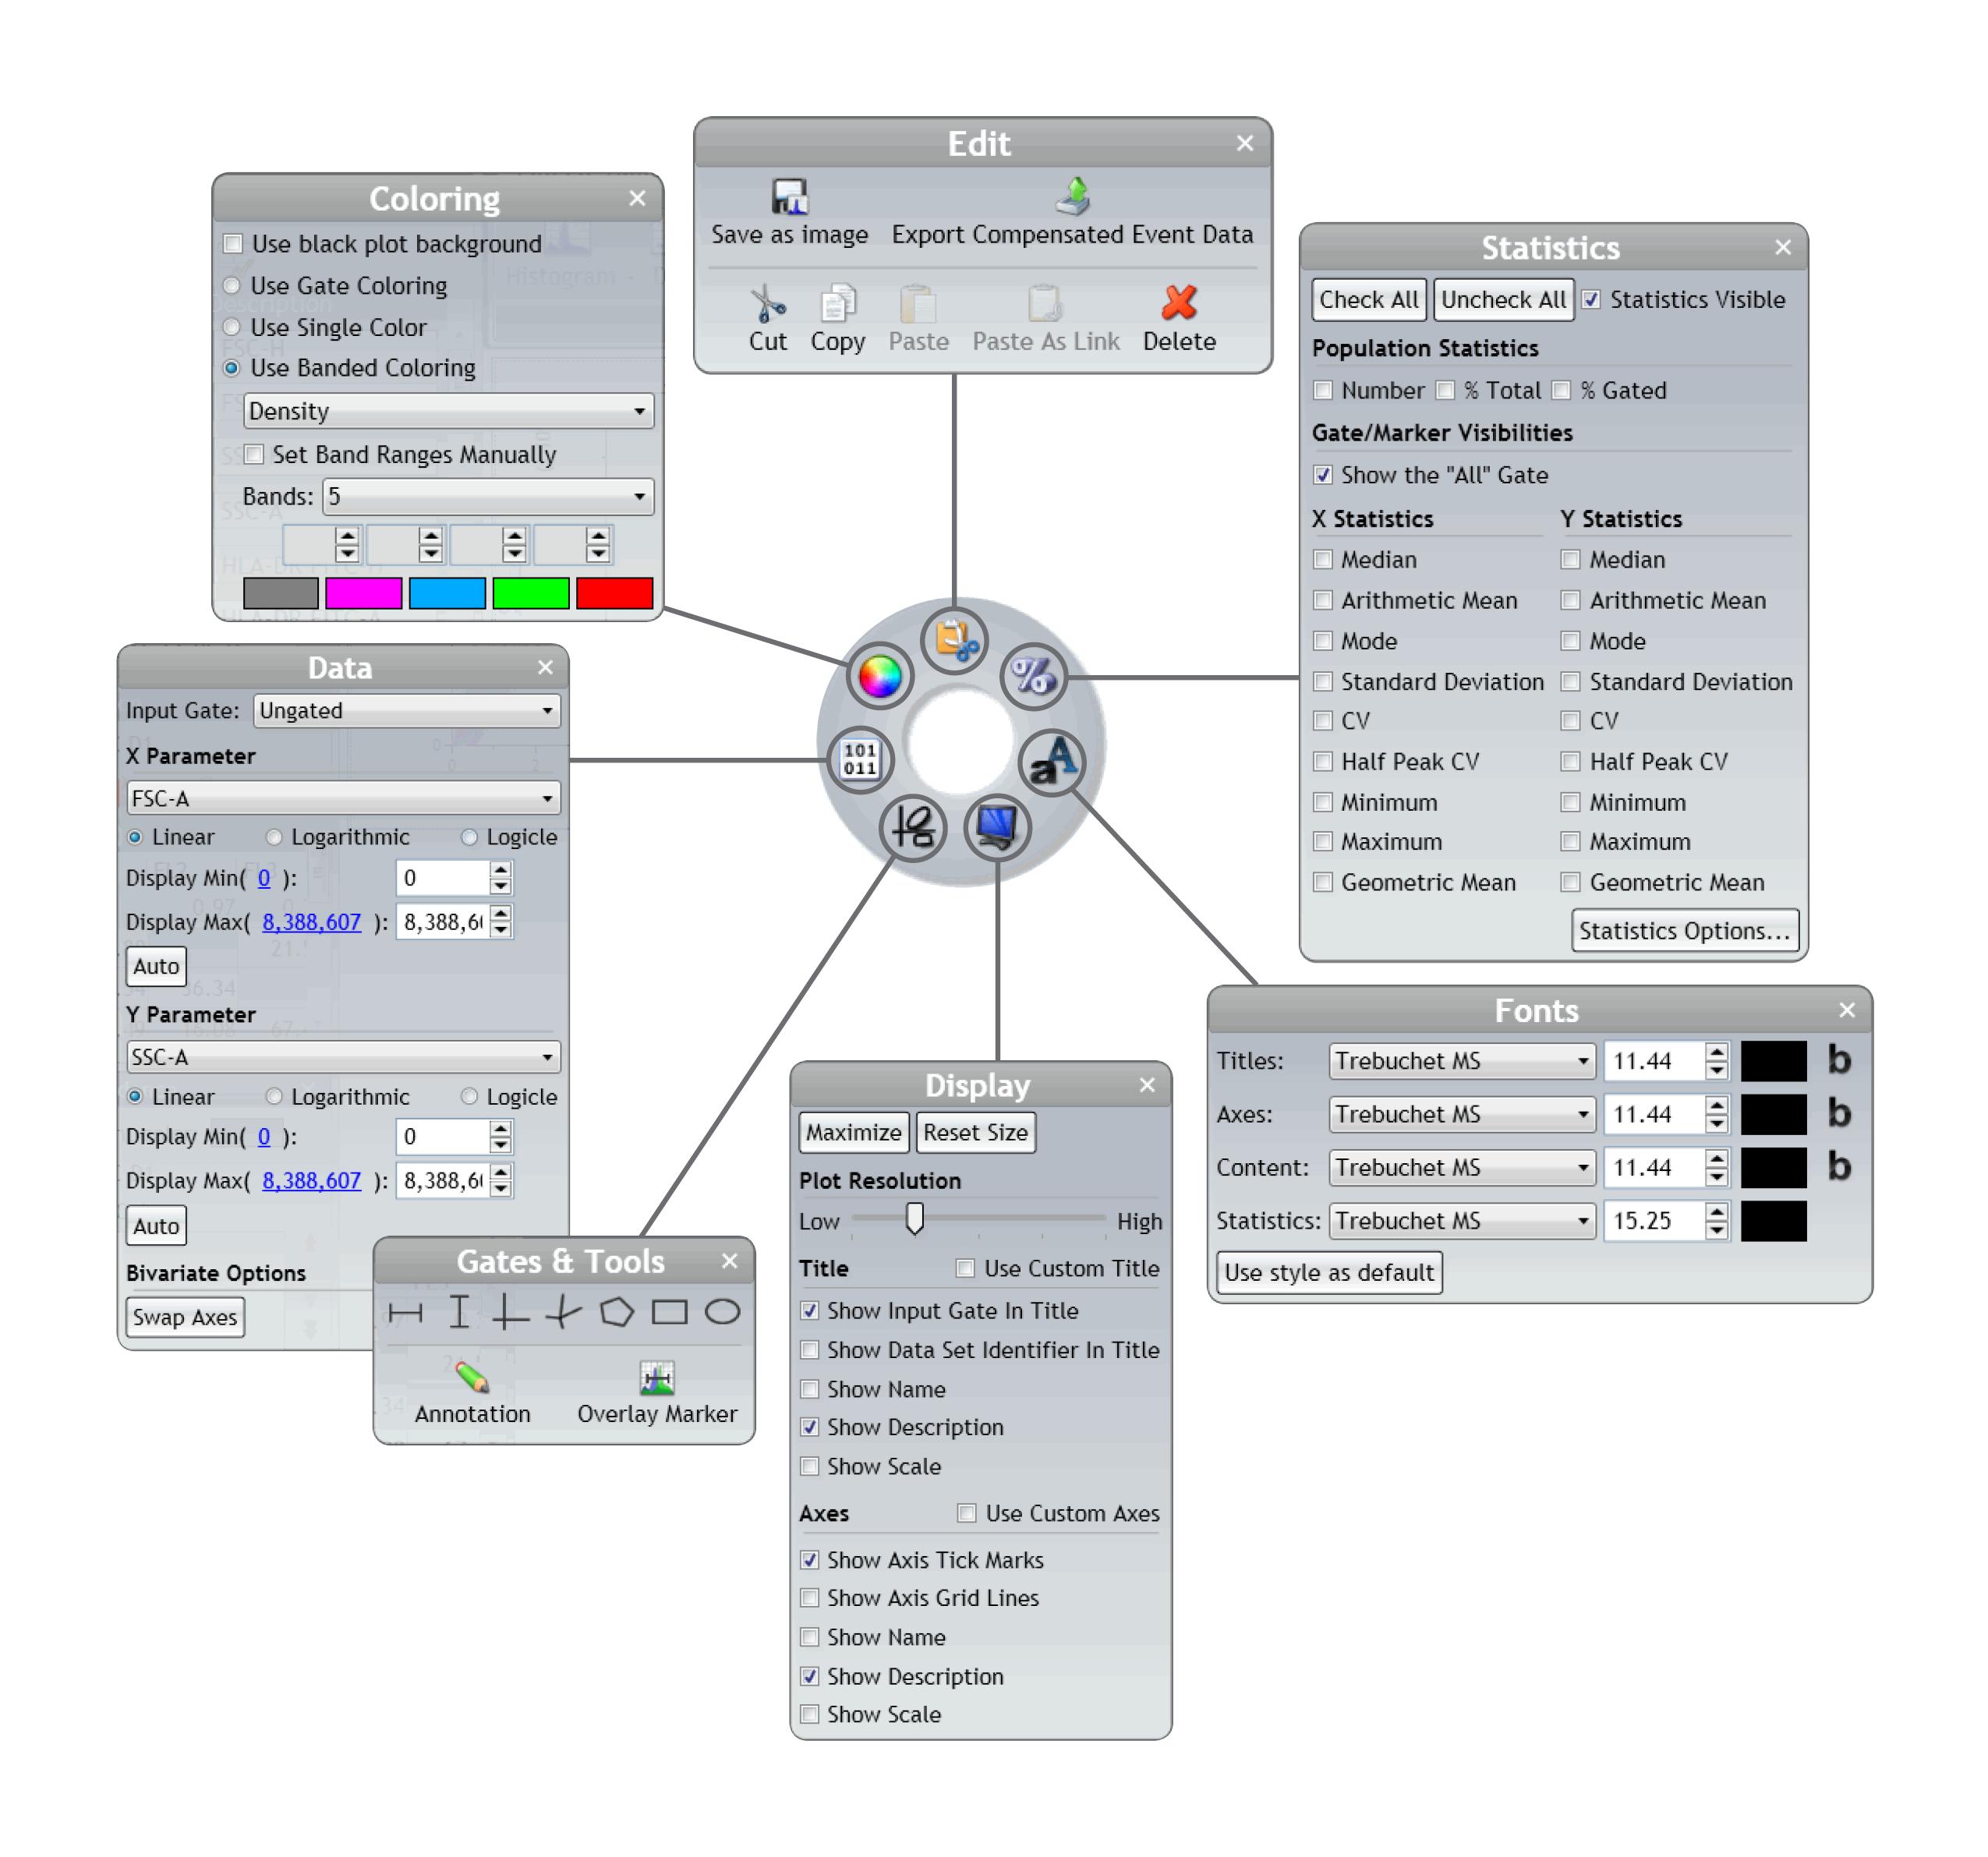 Menus radiais de contexto específico do software Kaluza Analysis